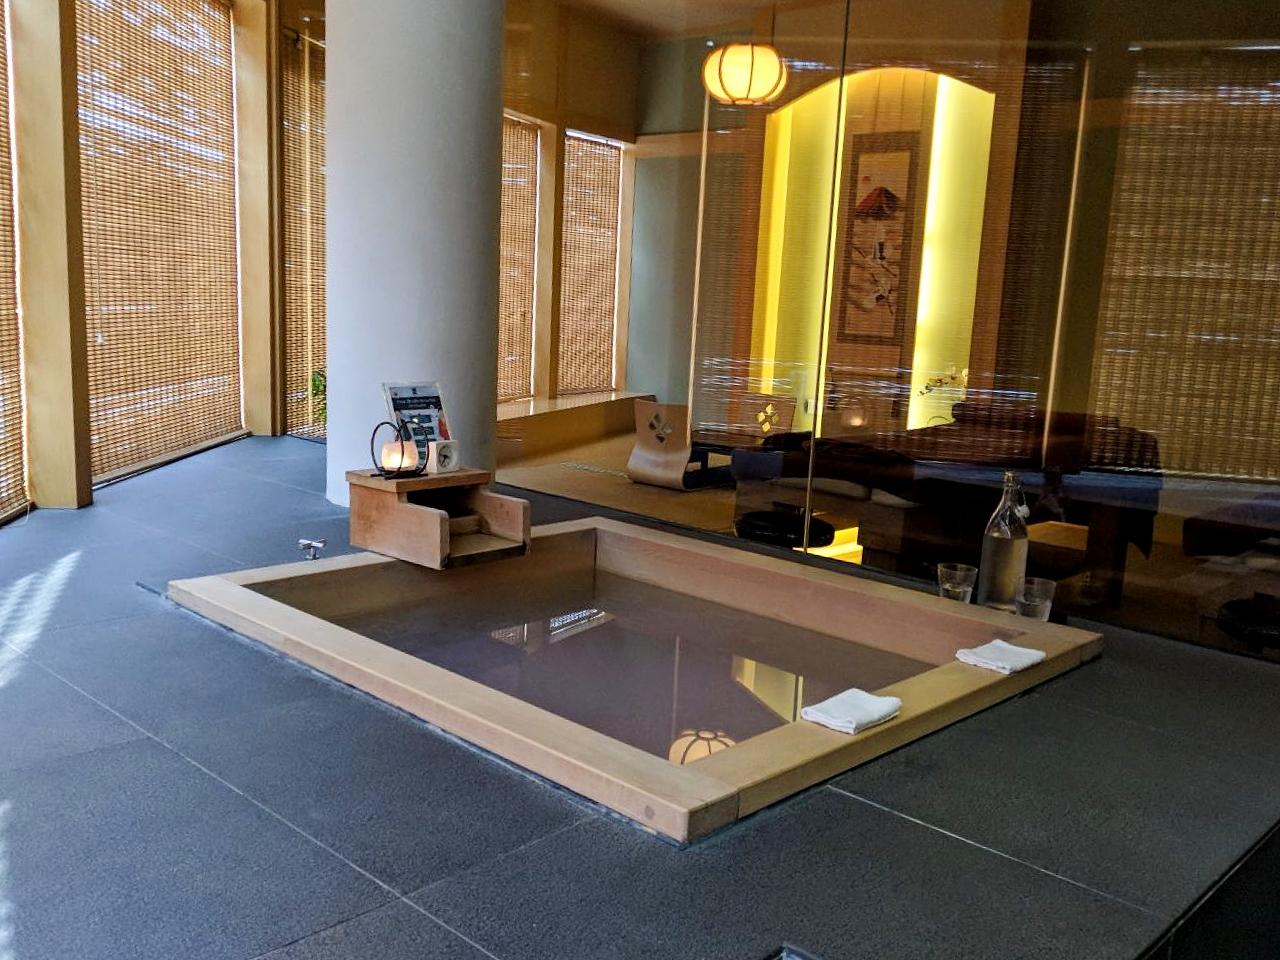 "The Hinoki Onsen uses Hinoki (cypress) wood for the bath ""tub""."